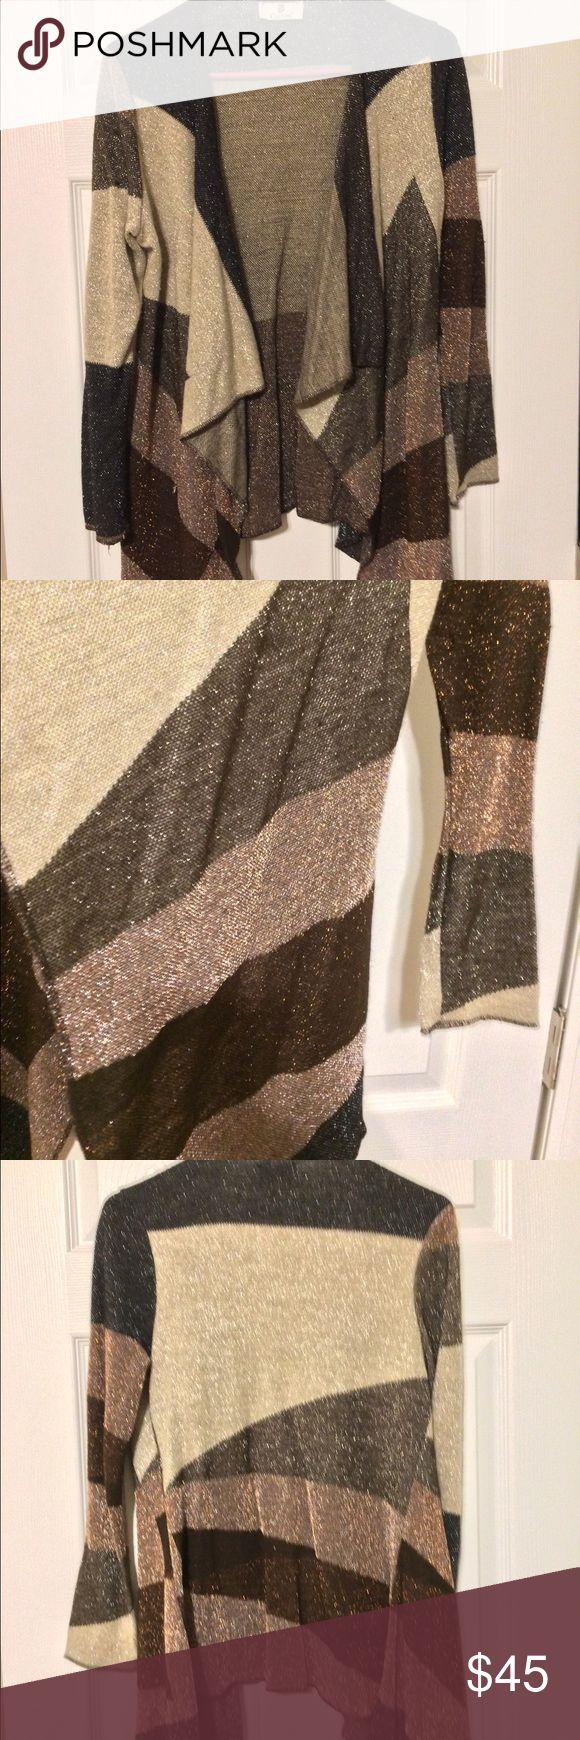 Brown-black-gold cardigan sweater Gold-black-brown glitter sweater Sweaters